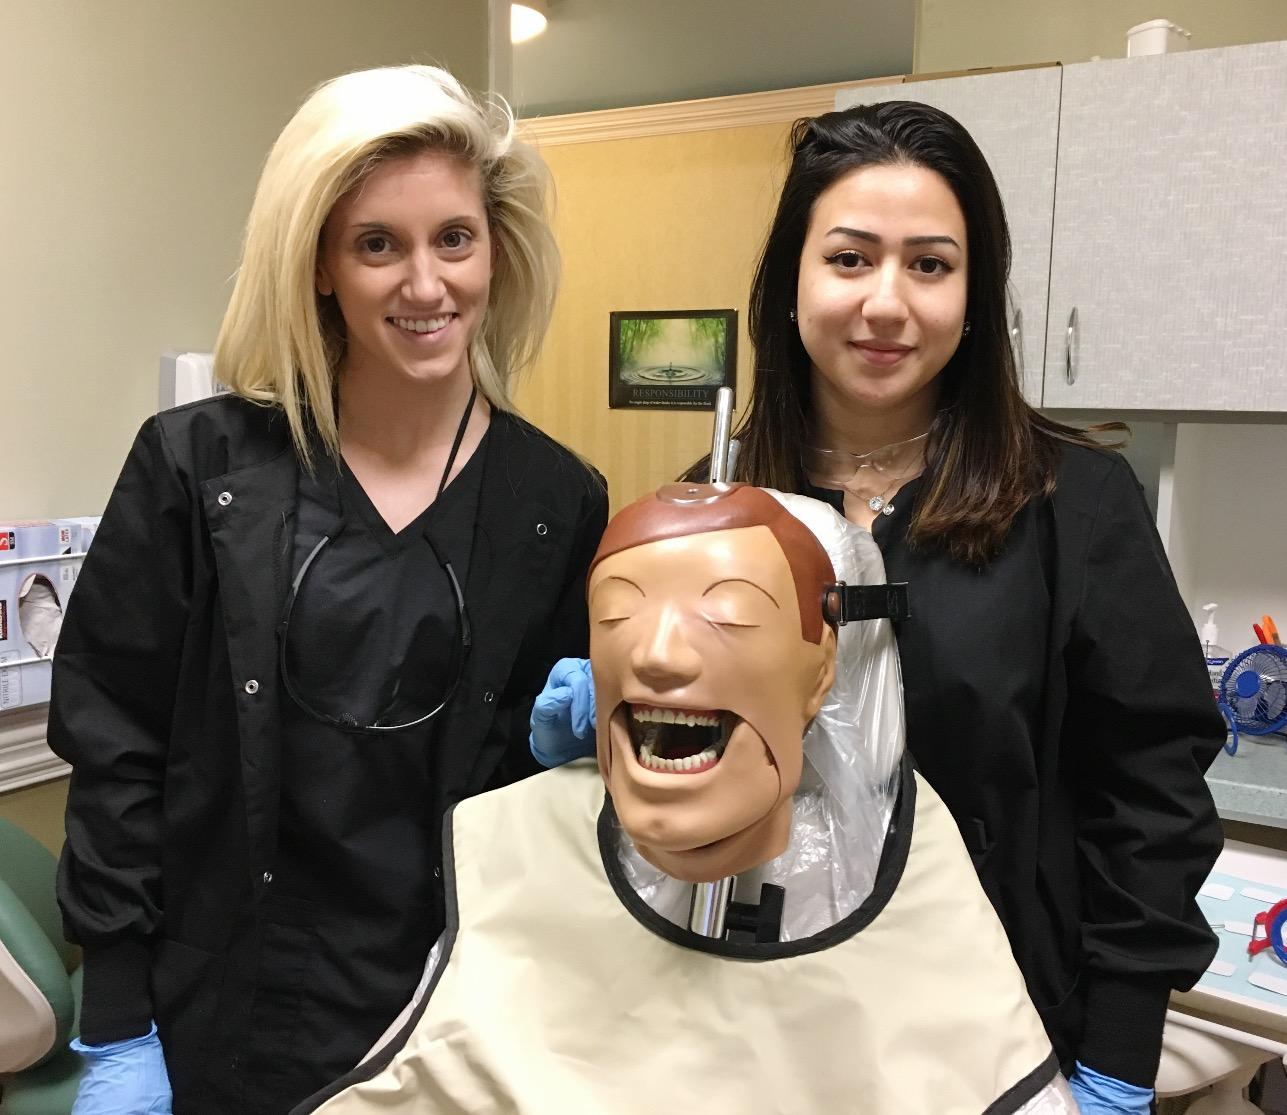 Dental Assistant Radiology Training